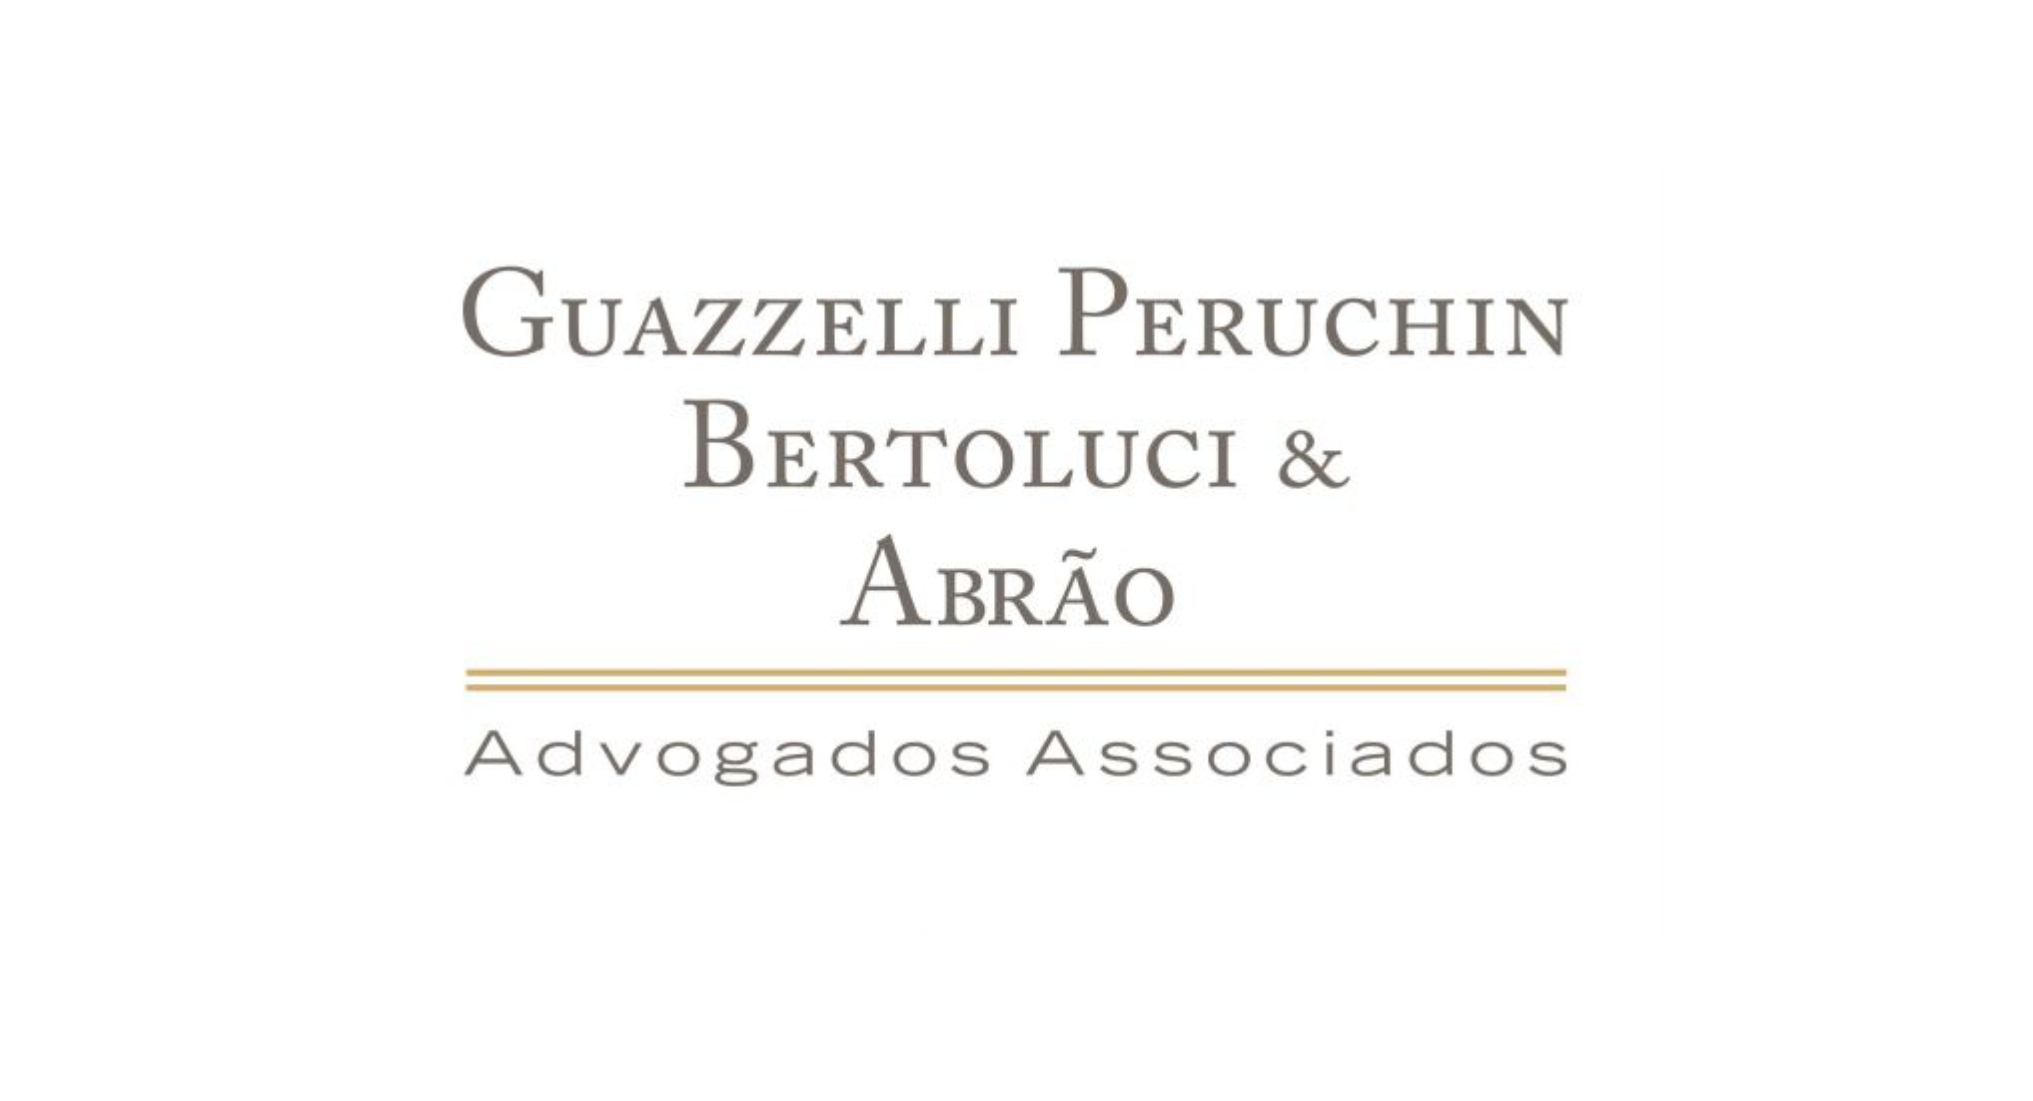 Guazzelli Peruchin